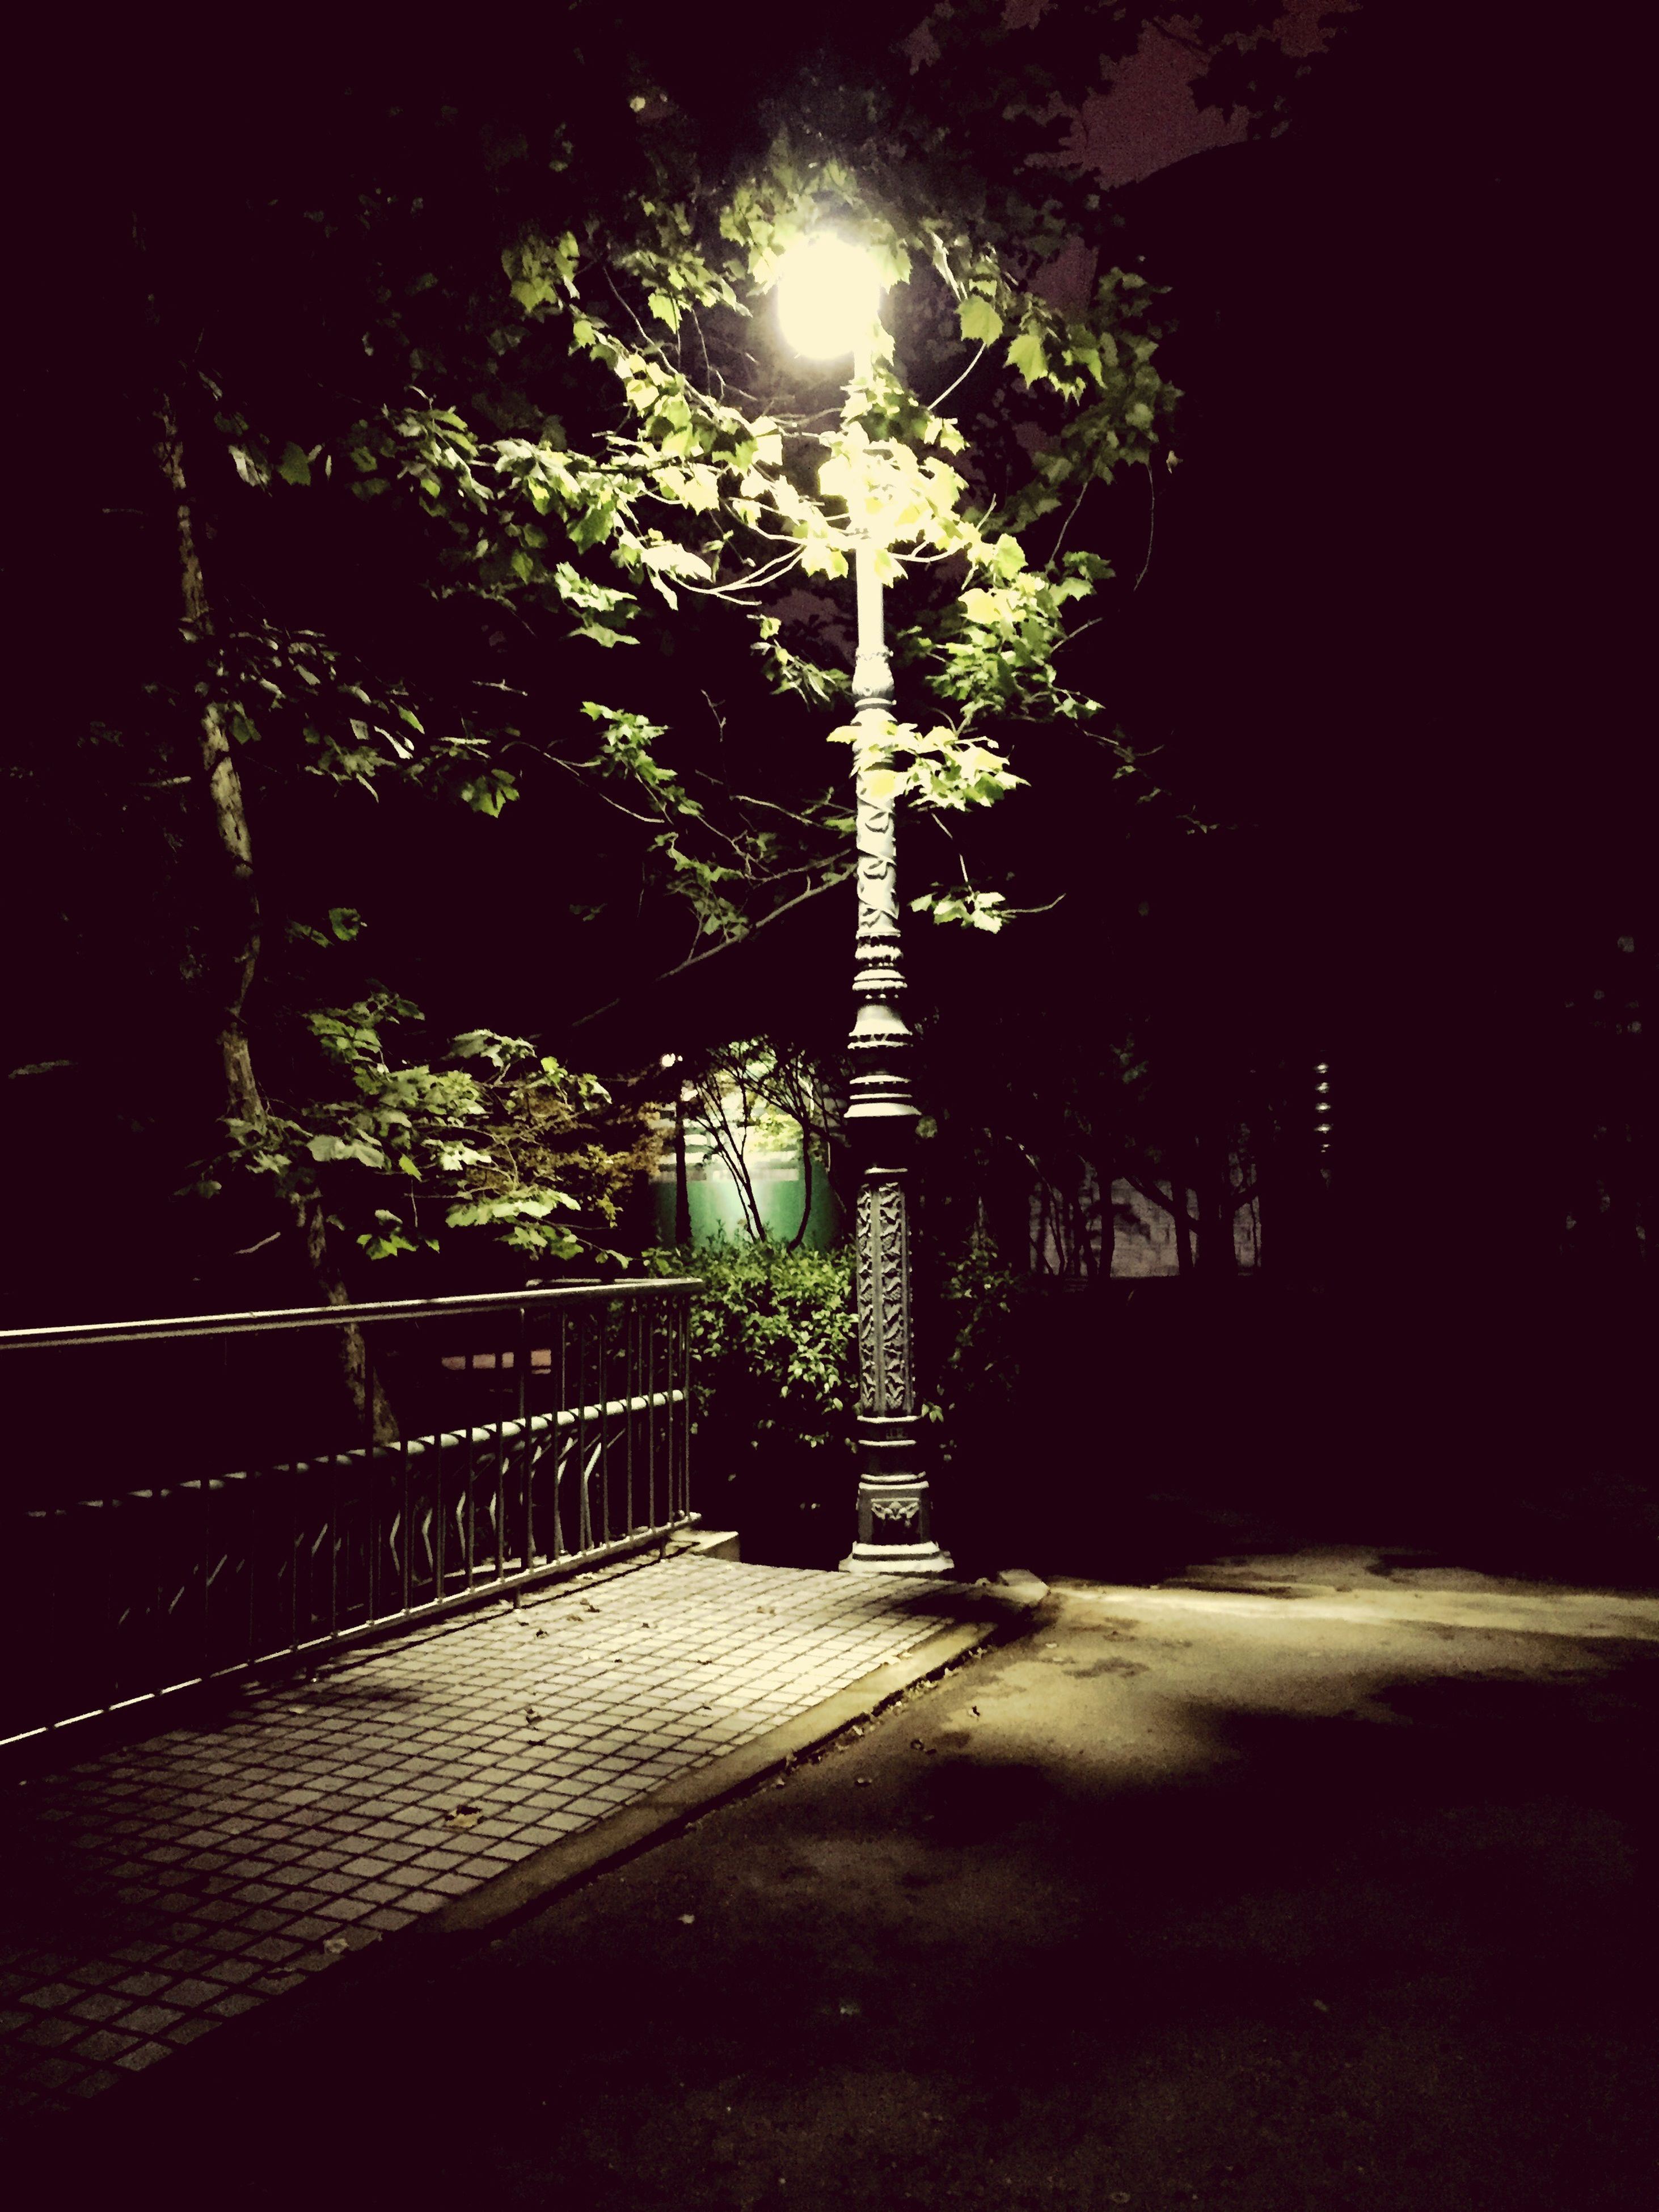 night, illuminated, street light, lighting equipment, tree, the way forward, built structure, street, footpath, empty, architecture, sidewalk, sunlight, building exterior, absence, outdoors, shadow, walkway, no people, railing